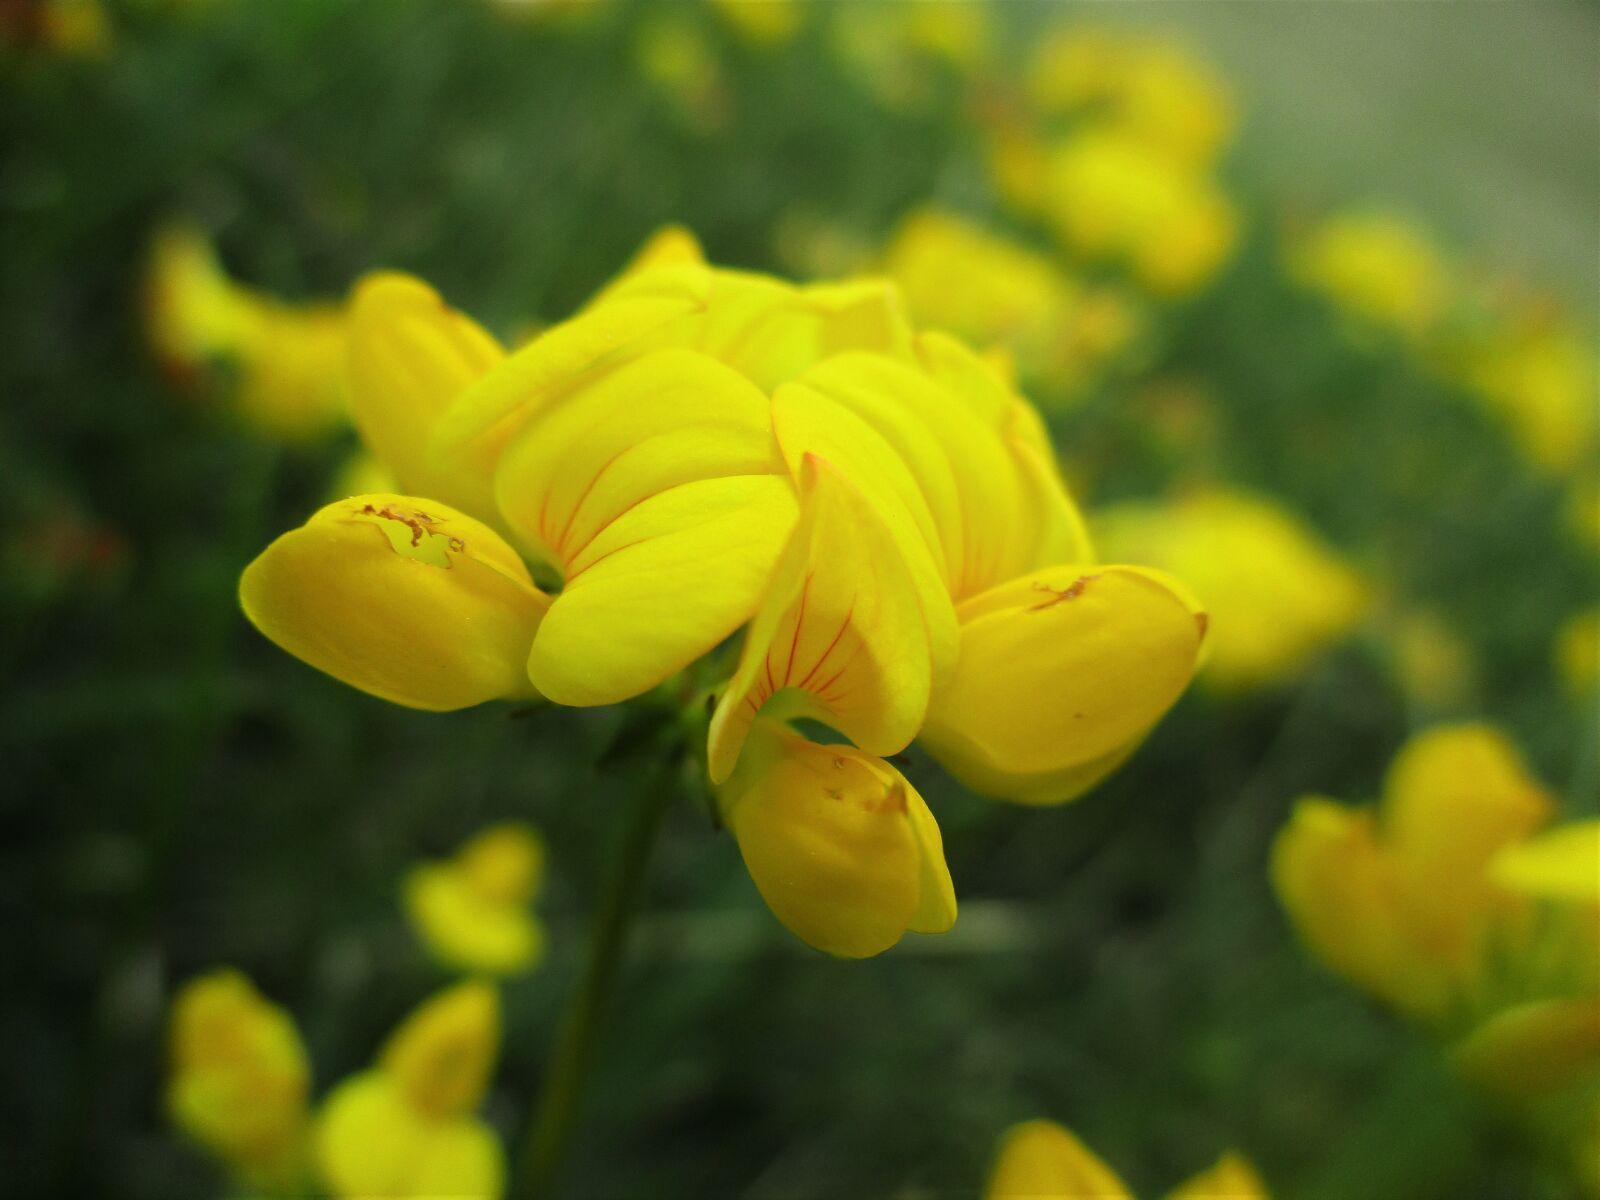 "Canon PowerShot ELPH 180 (IXUS 175 / IXY 180) sample photo. ""Clover, yellow, bloom"" photography"